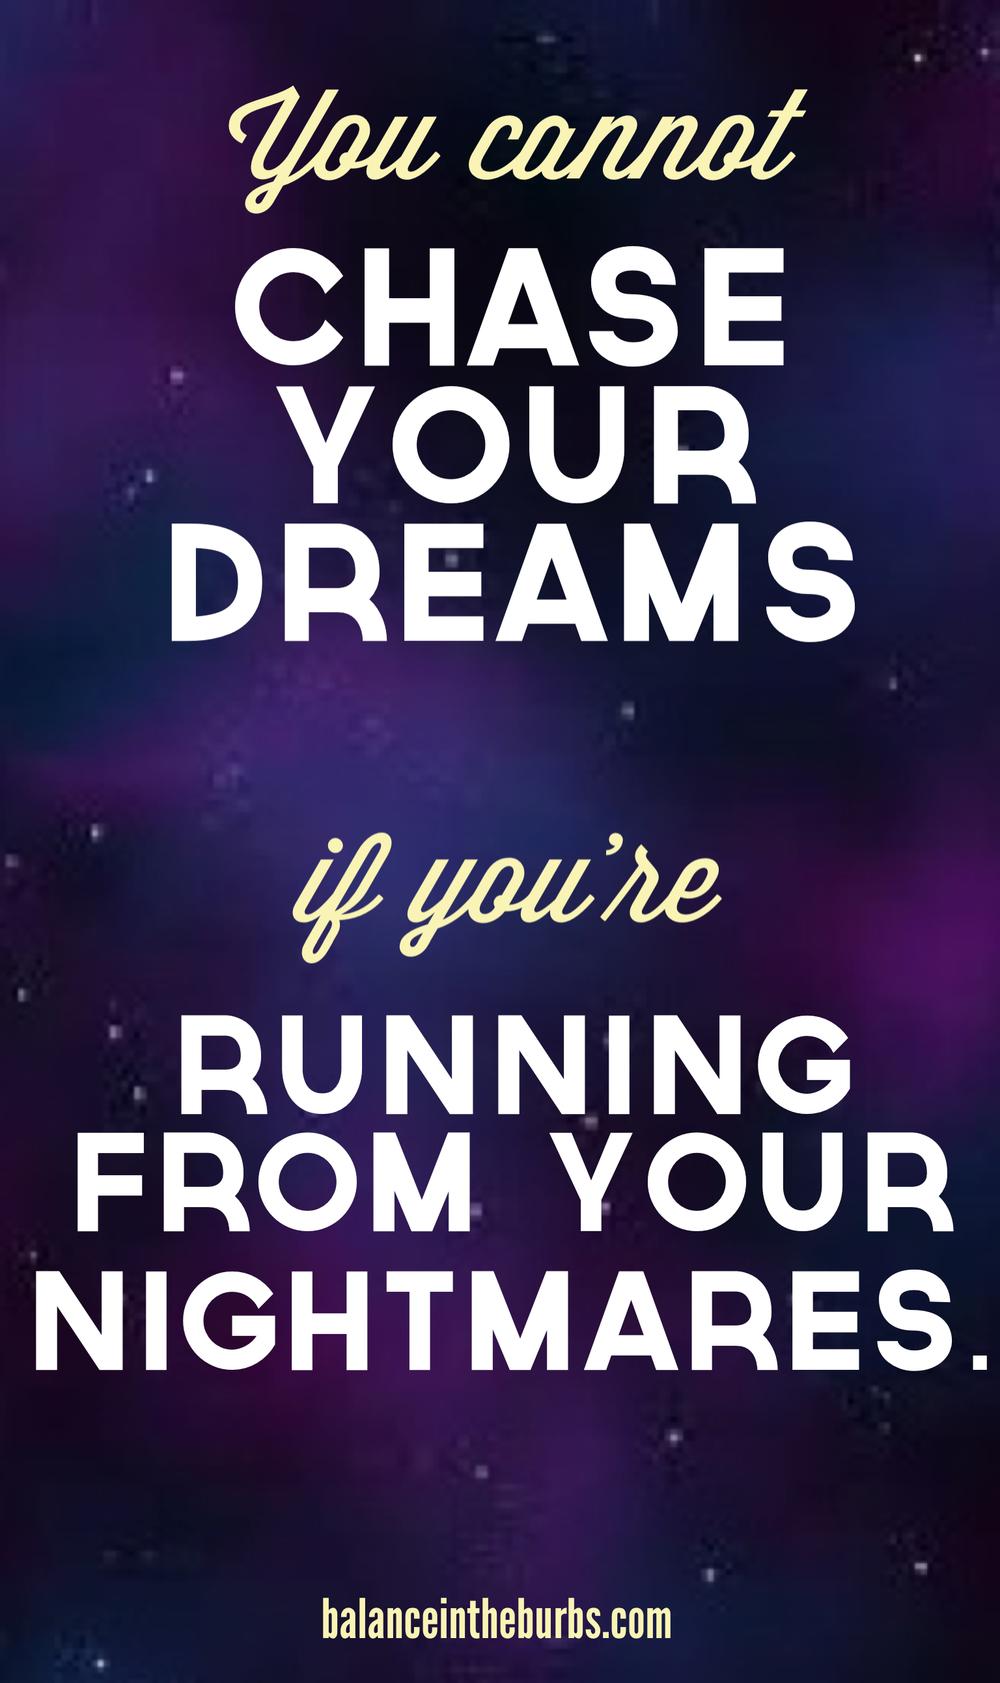 balanceintheburbs-dreamsquote.jpg